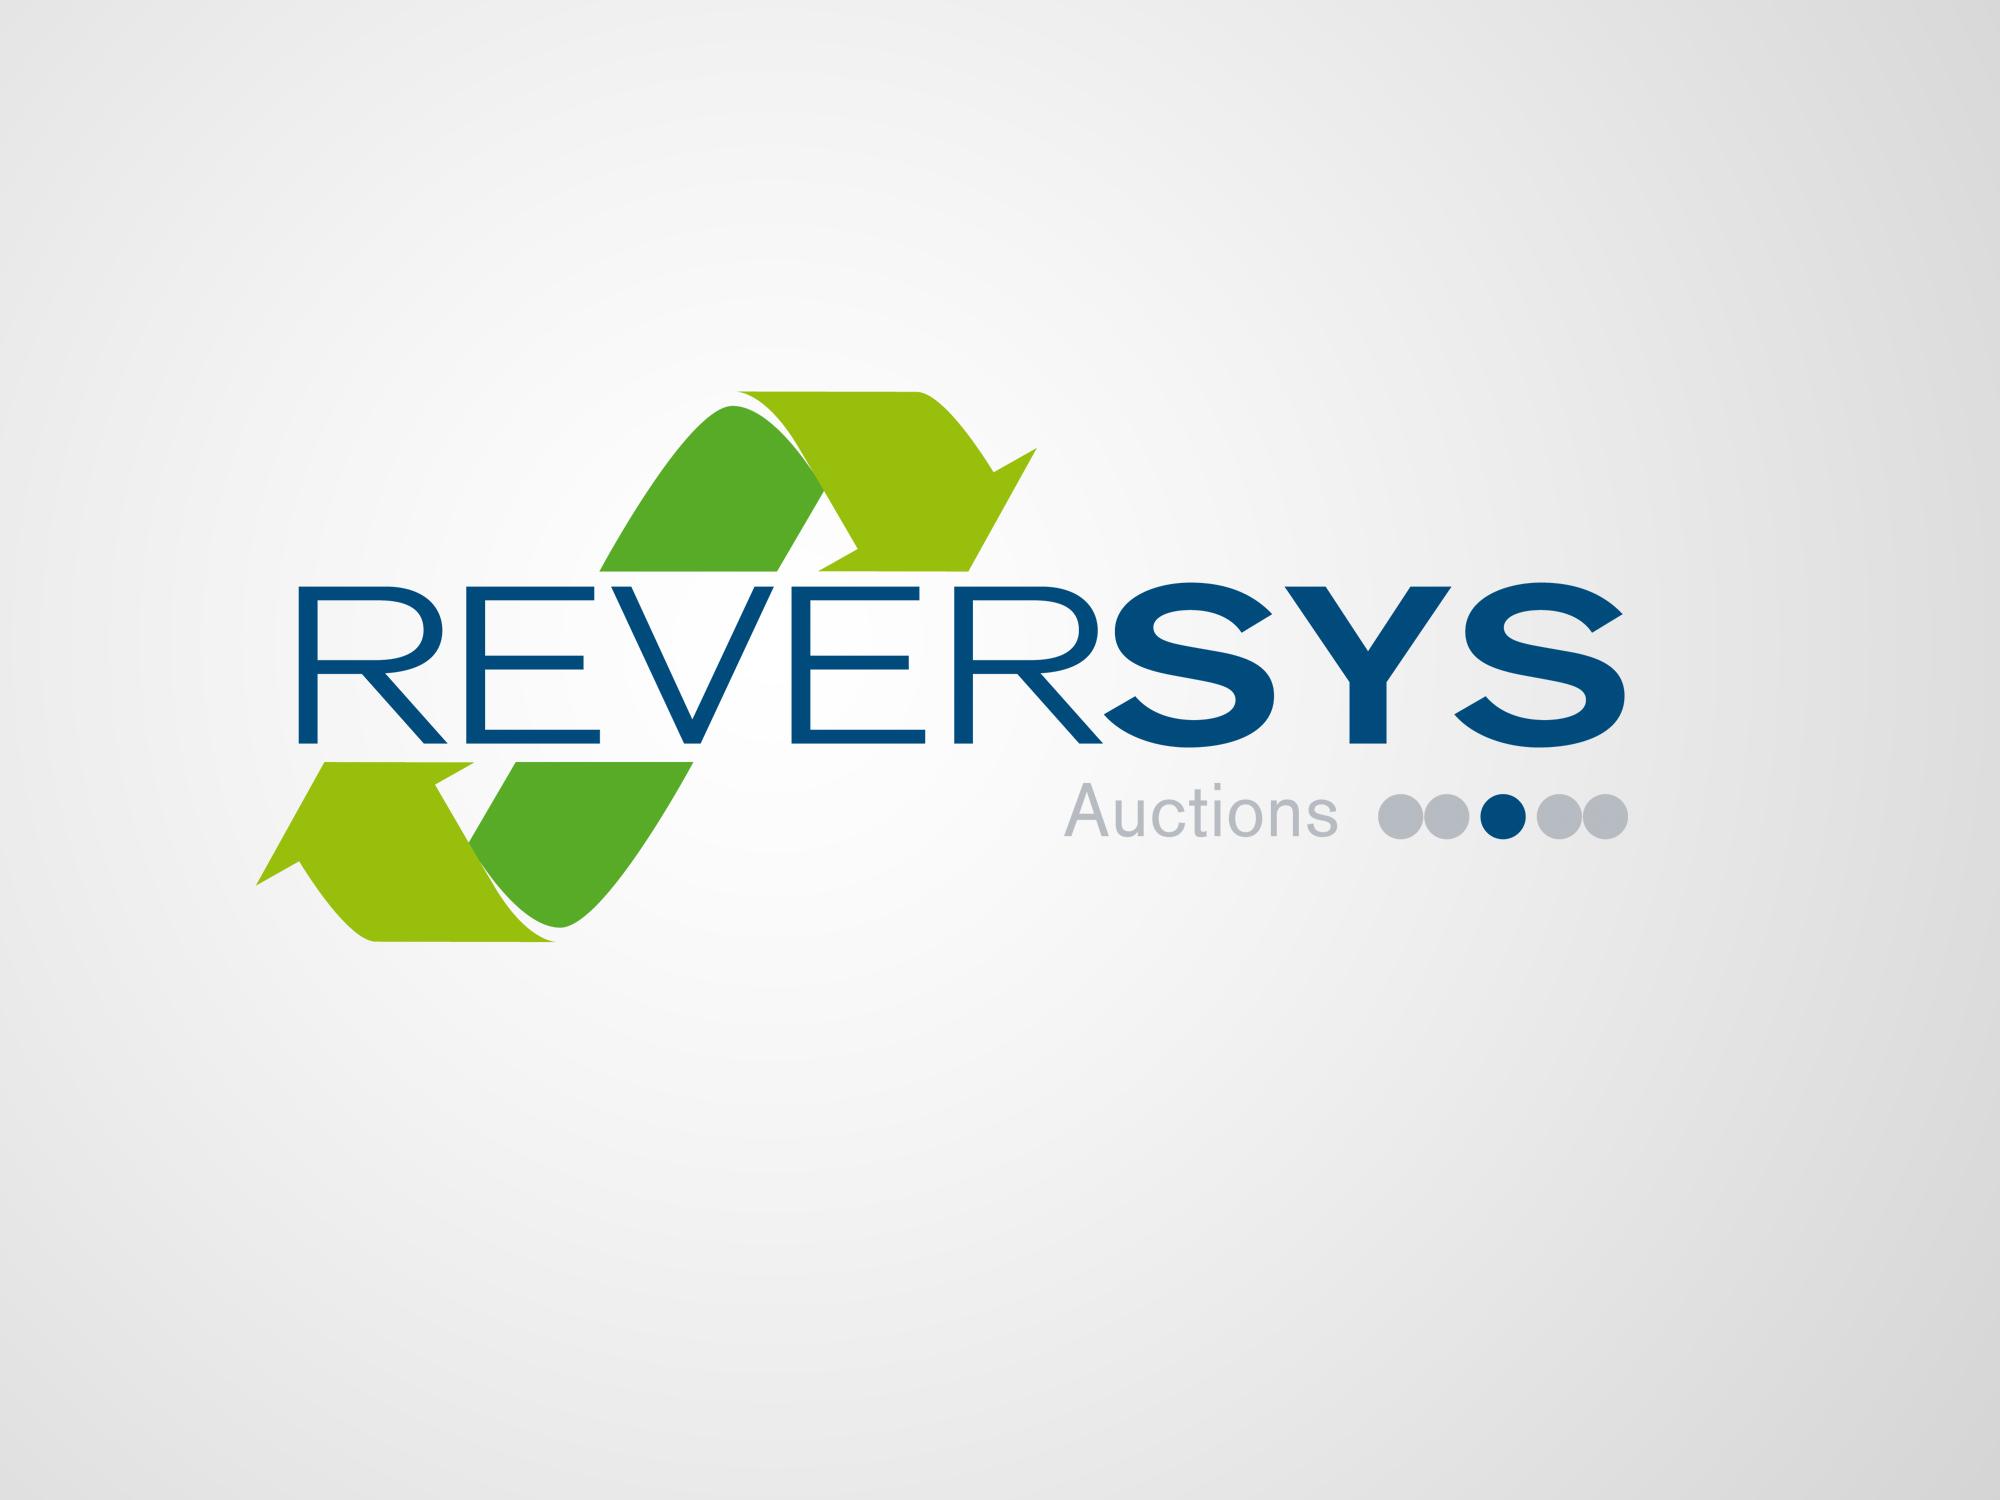 Logogestaltung-reversys